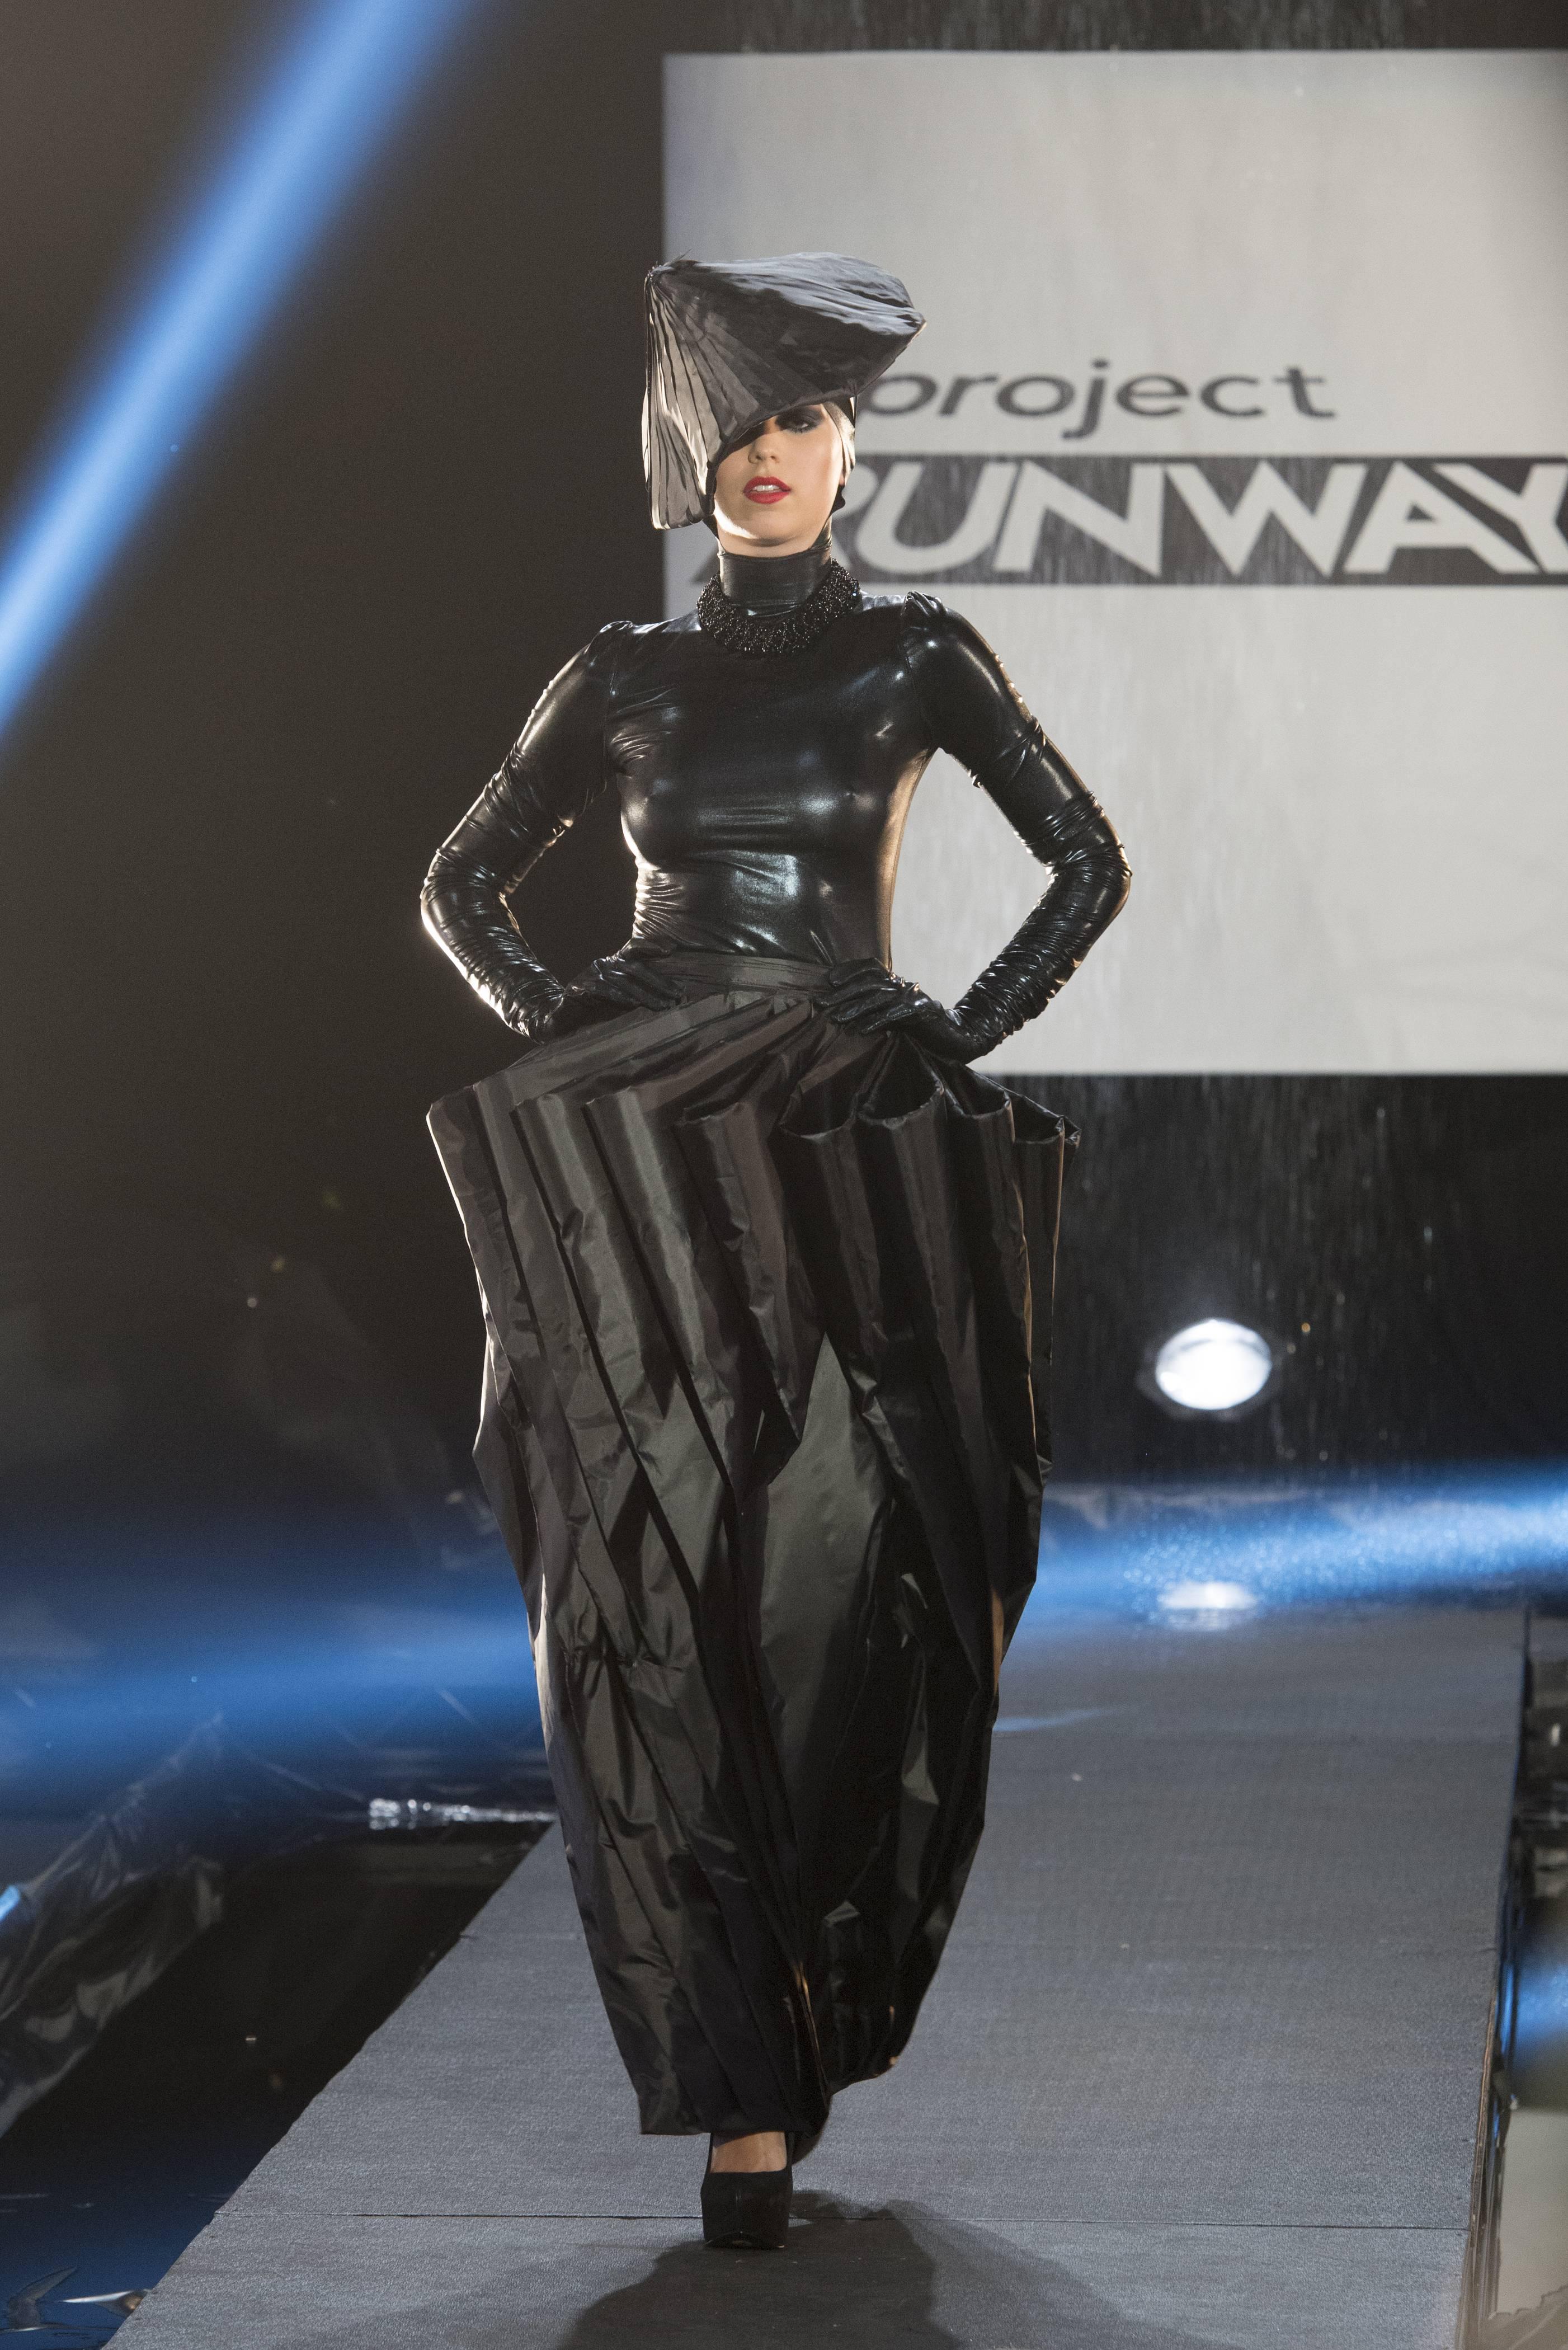 dress - Garde avant runway trend video